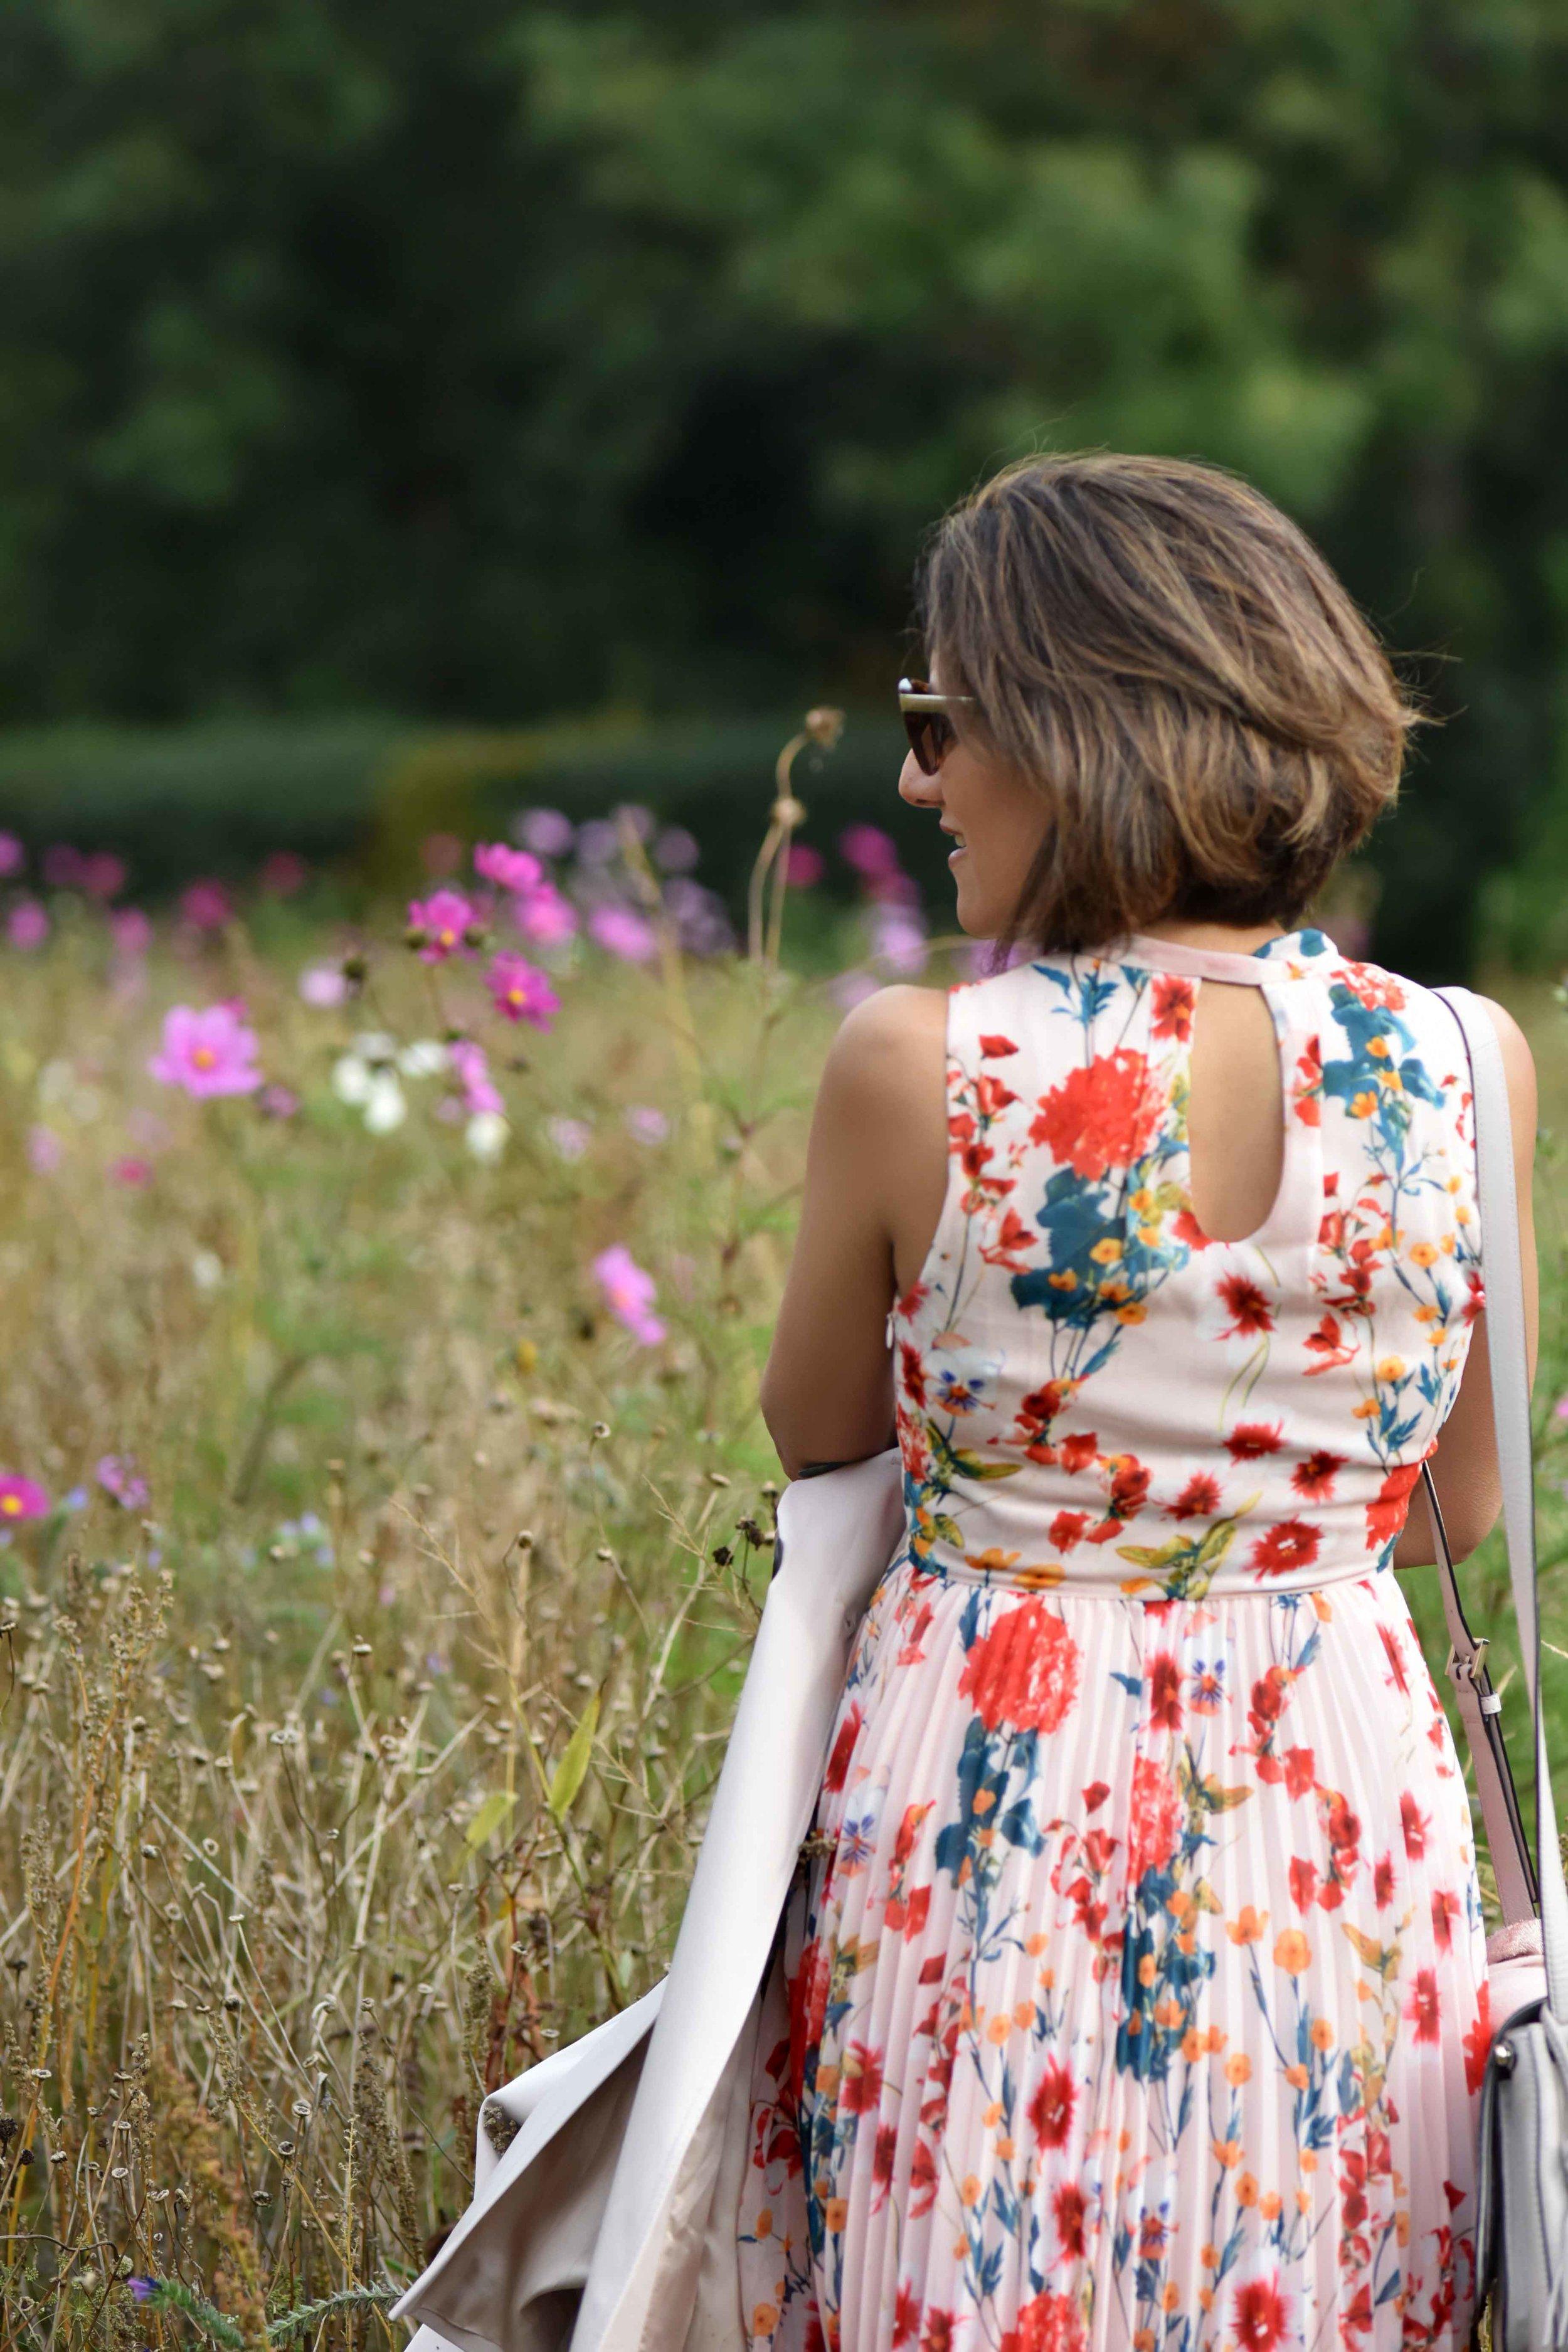 Karen Millen floral summer dress, flower fields, Coworth Park hotel, Ascot. Image©sourcingstyle.com